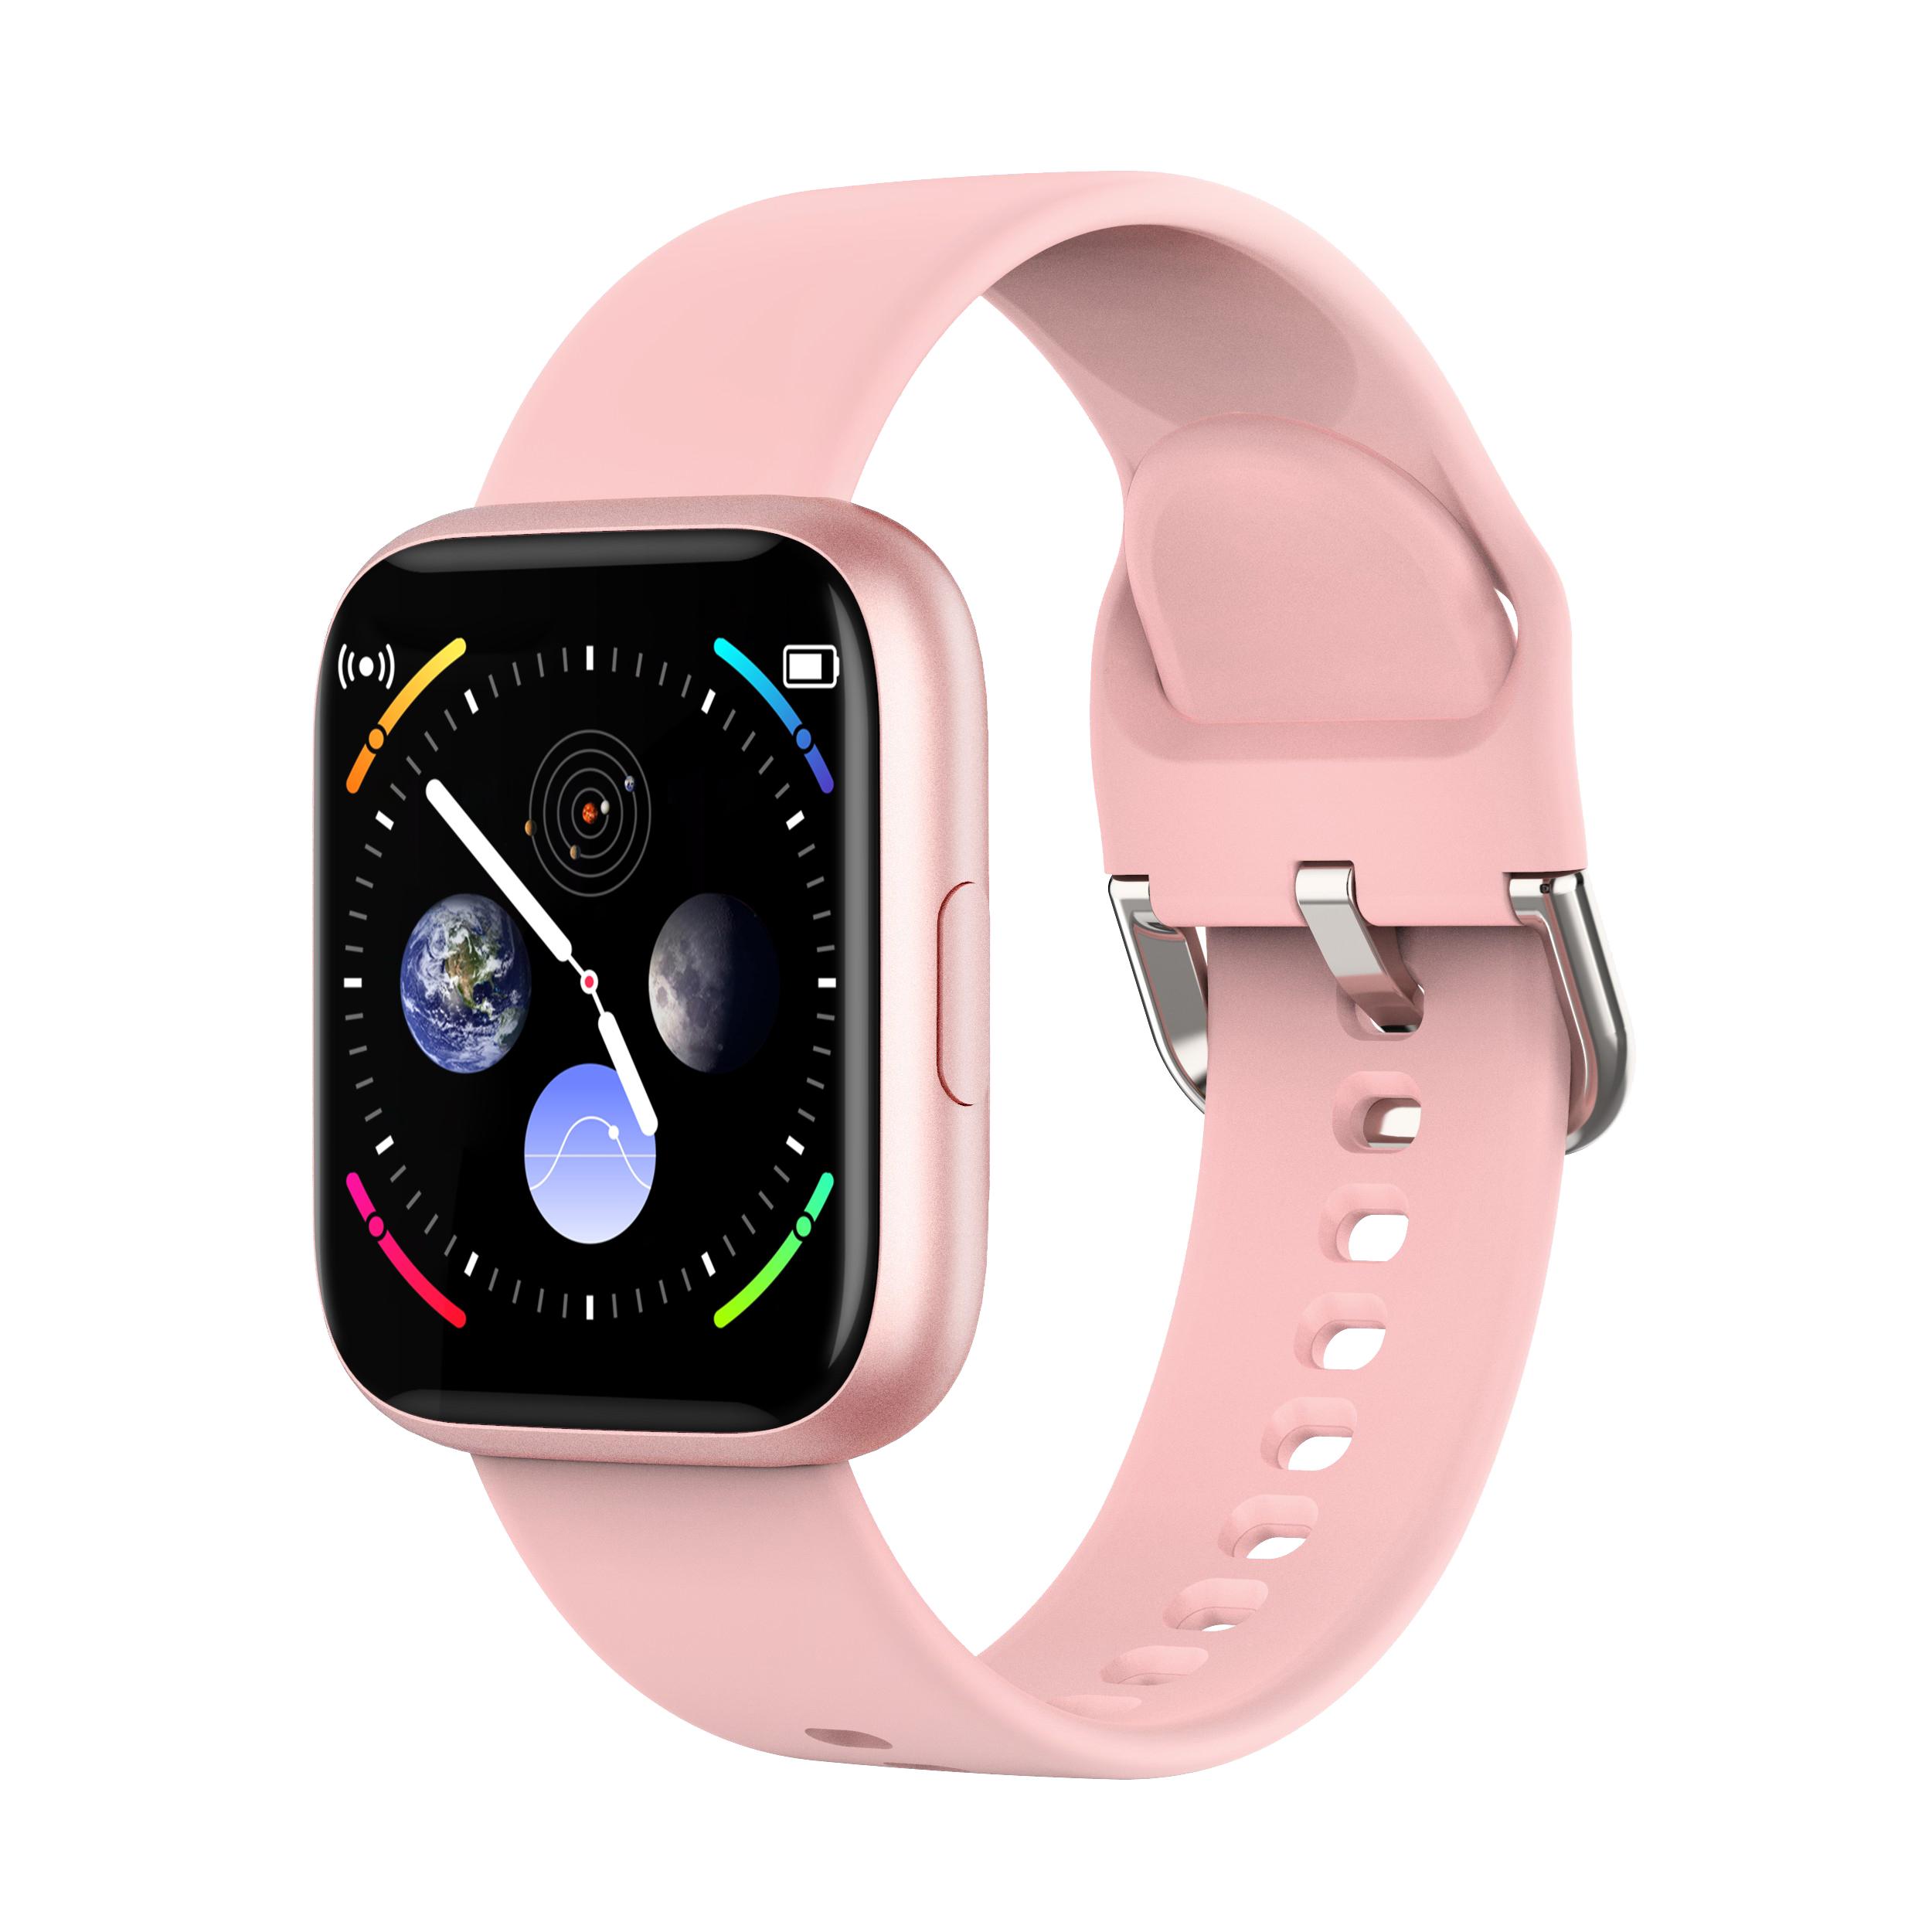 P6 Smart Bracelet Heart Rate Blood Pressure Health Waterproof Smart Watch Bluetooth Watch Wristband Fitness Tracker Pink